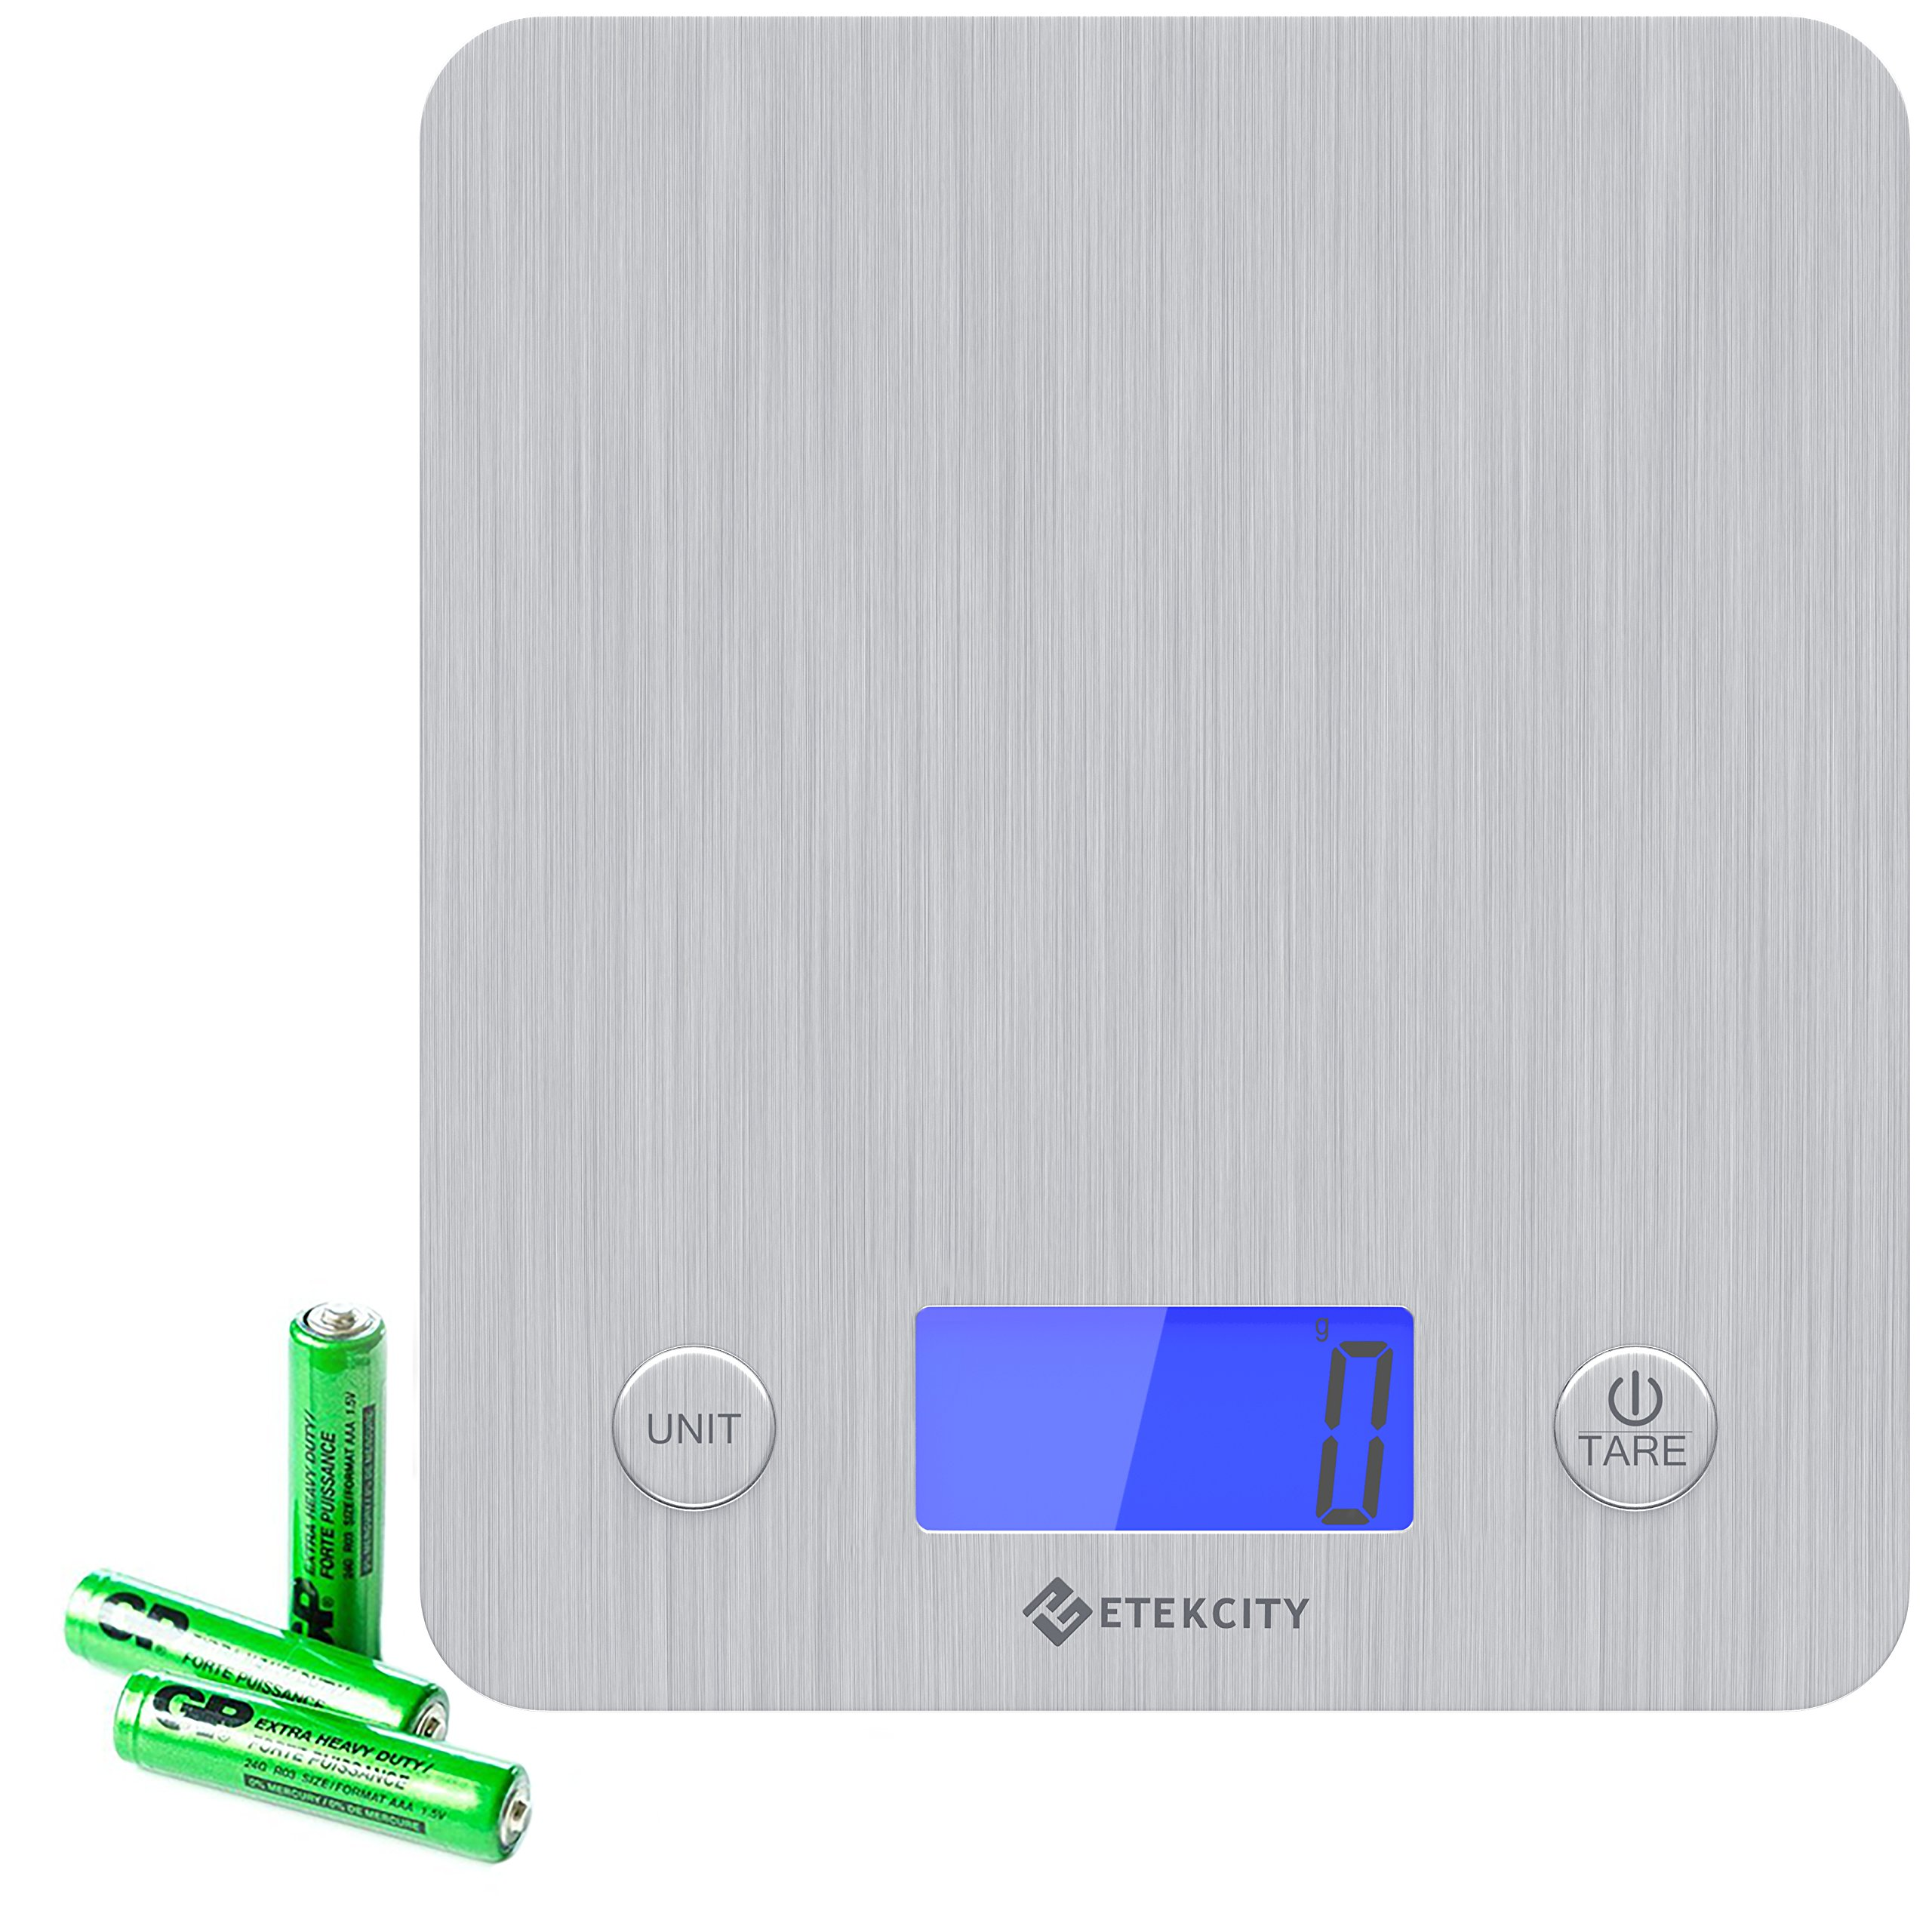 Etekcity EK6212 Digital Kitchen Multifunction Food Scale with Large Platform 11lb 5kg, Batteries Included (Stainless Steel) (light silver)